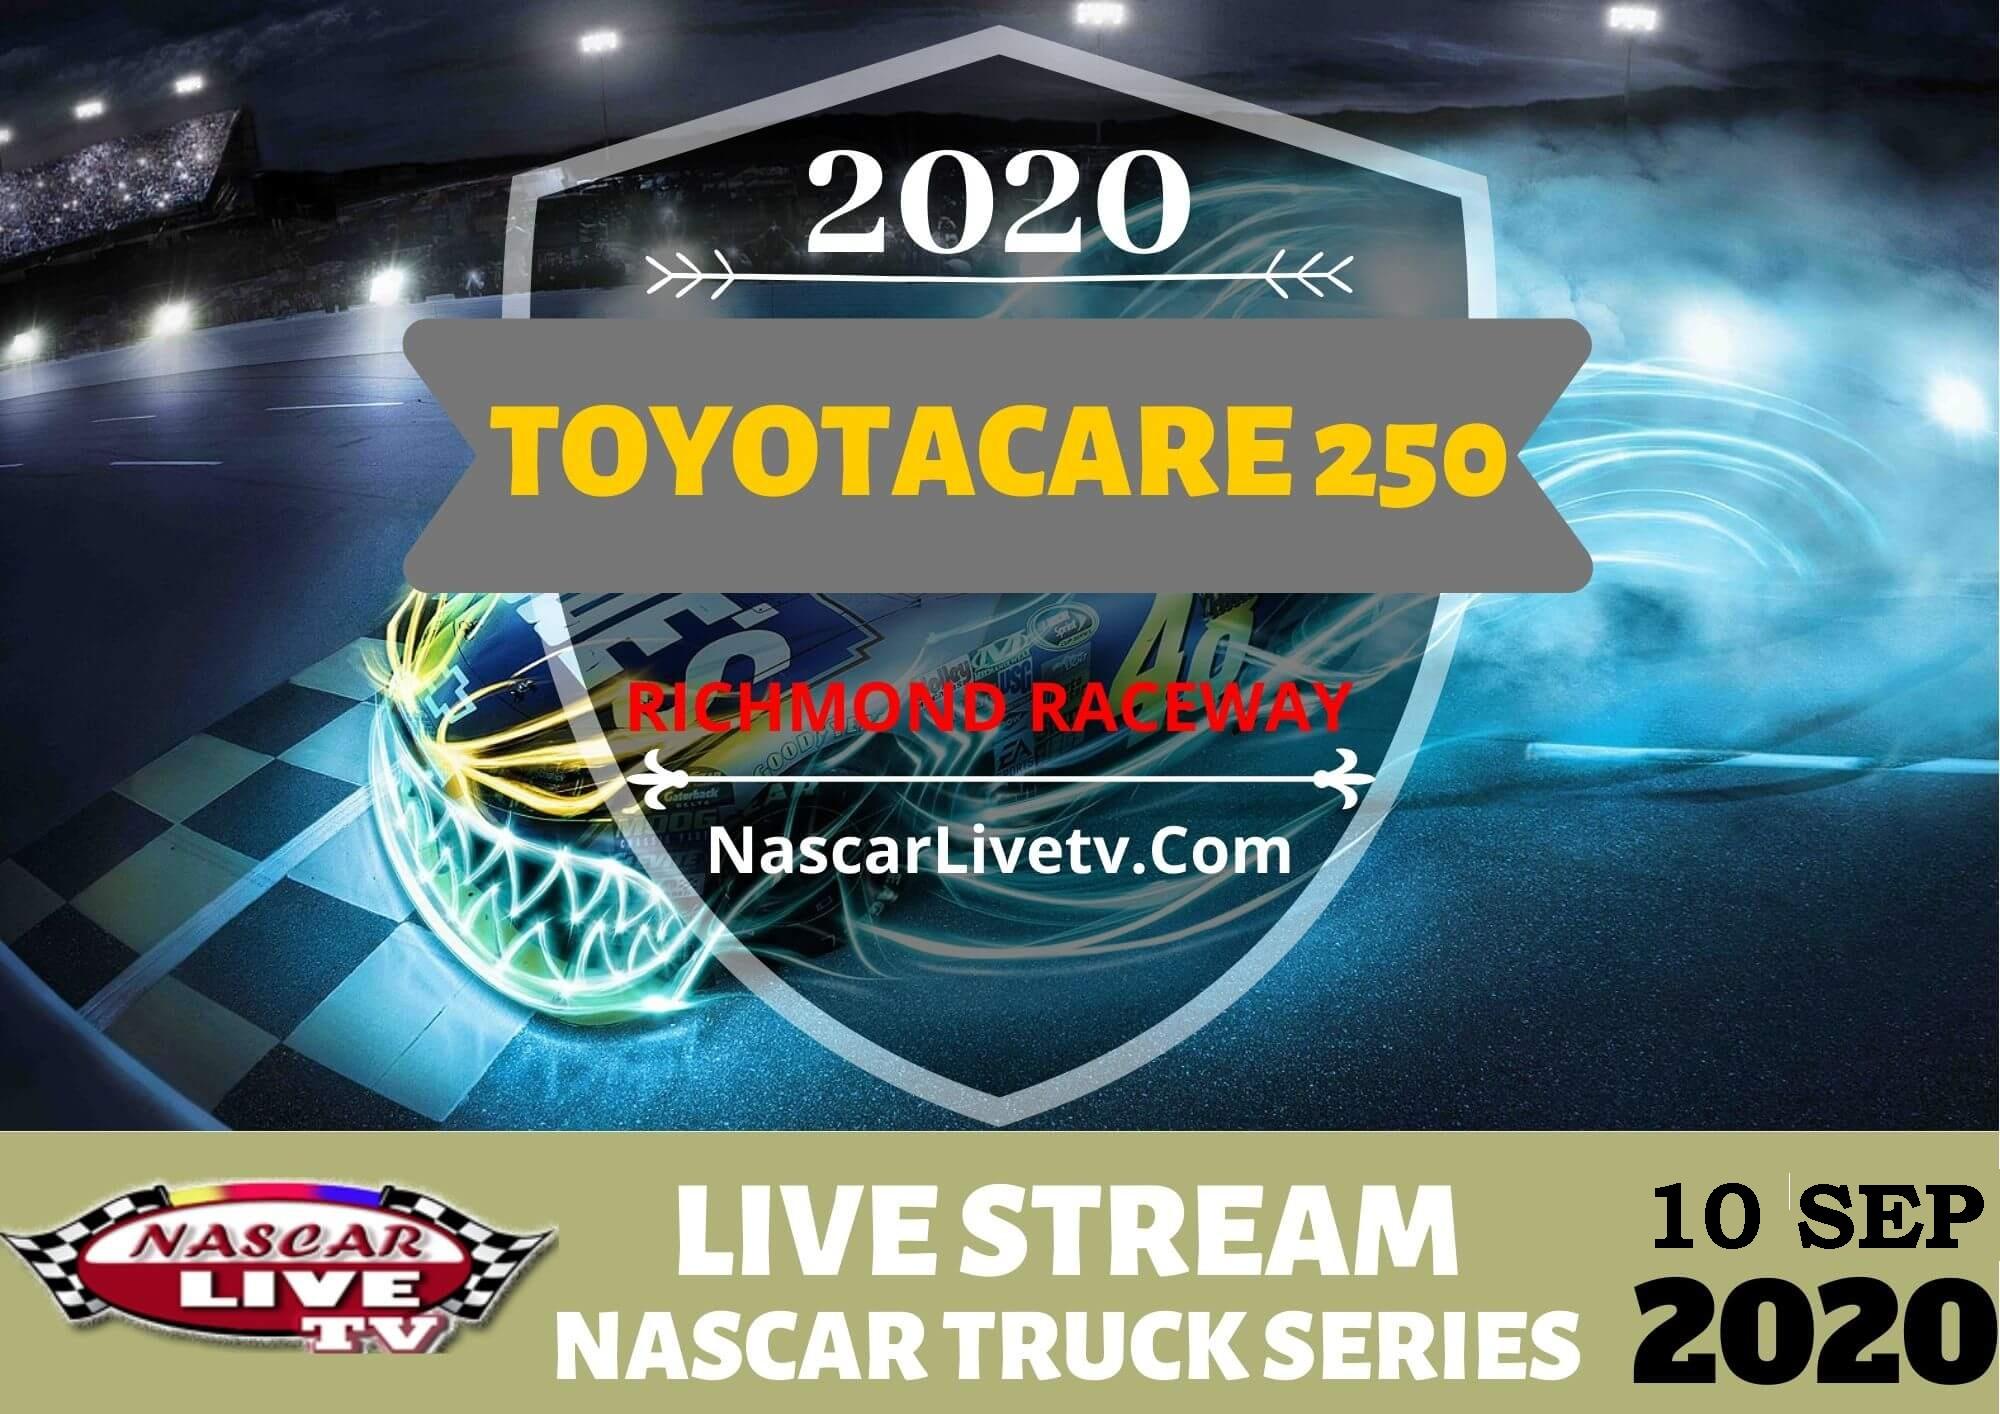 toyotacare-250-nascar-truck-live-stream